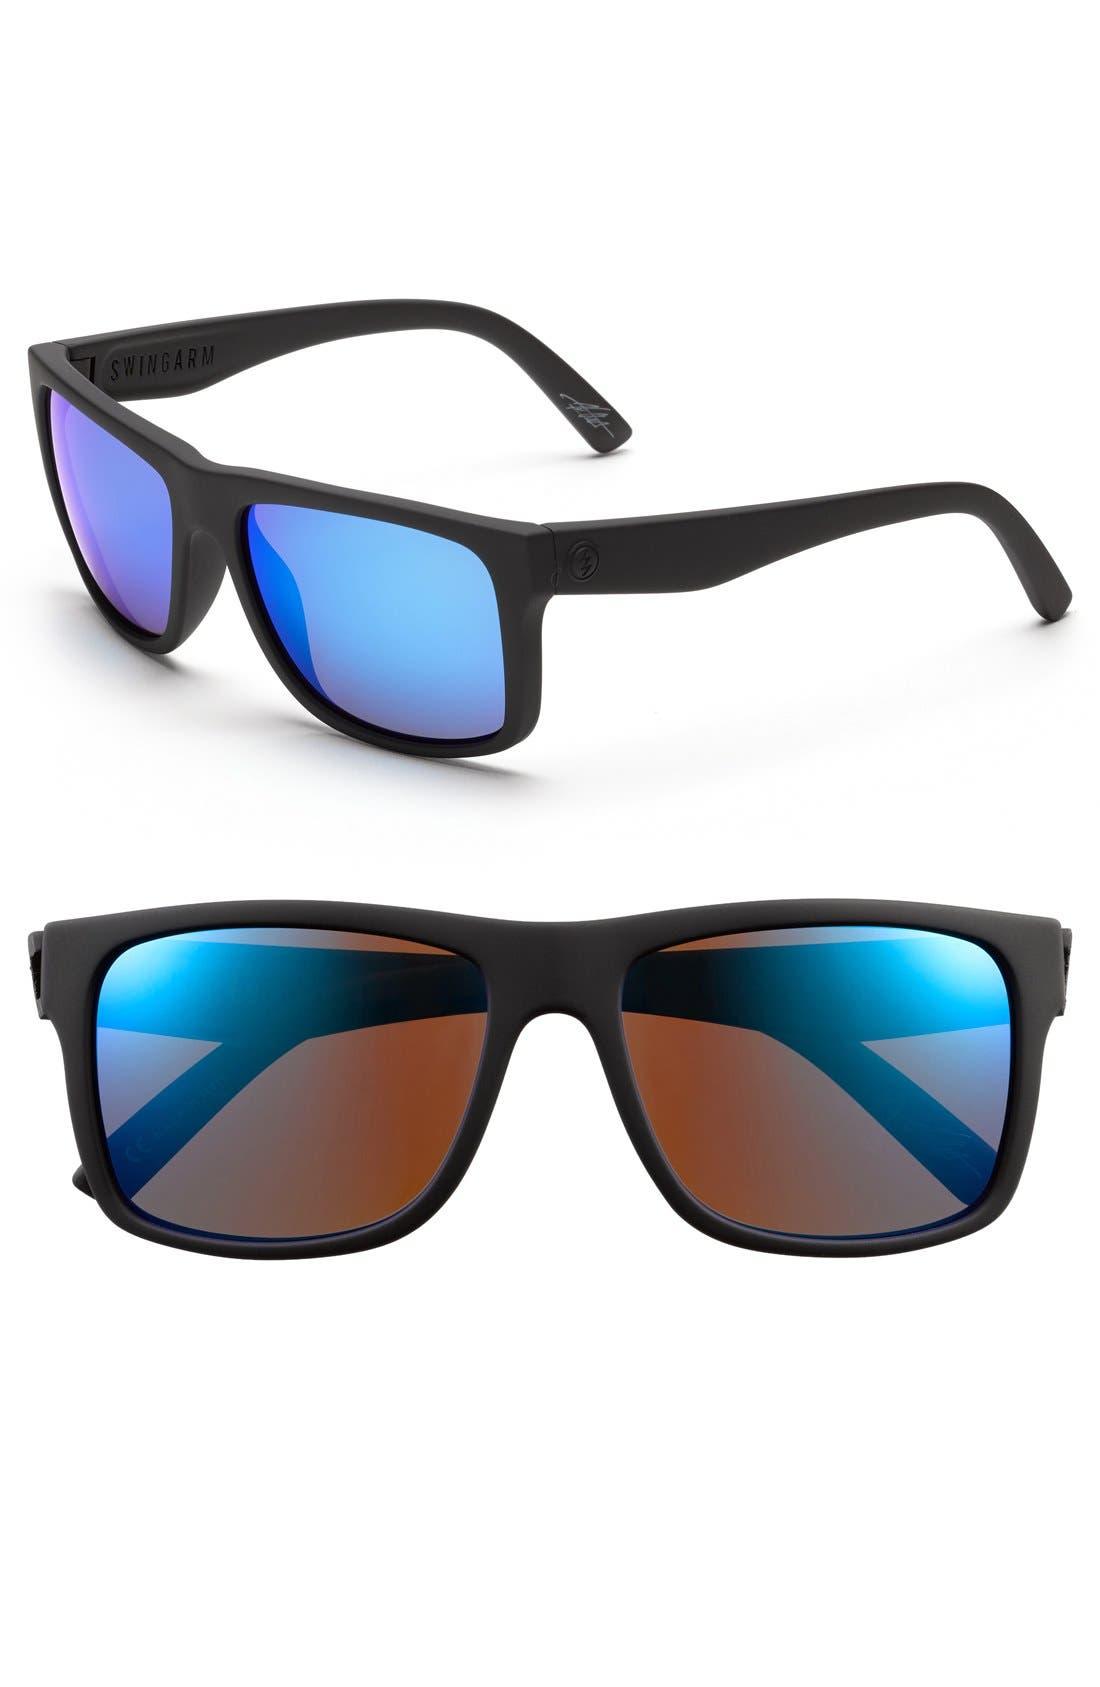 'Swingarm' 57mm Sunglasses,                             Main thumbnail 1, color,                             Ohm Grey/ Blue Chrome